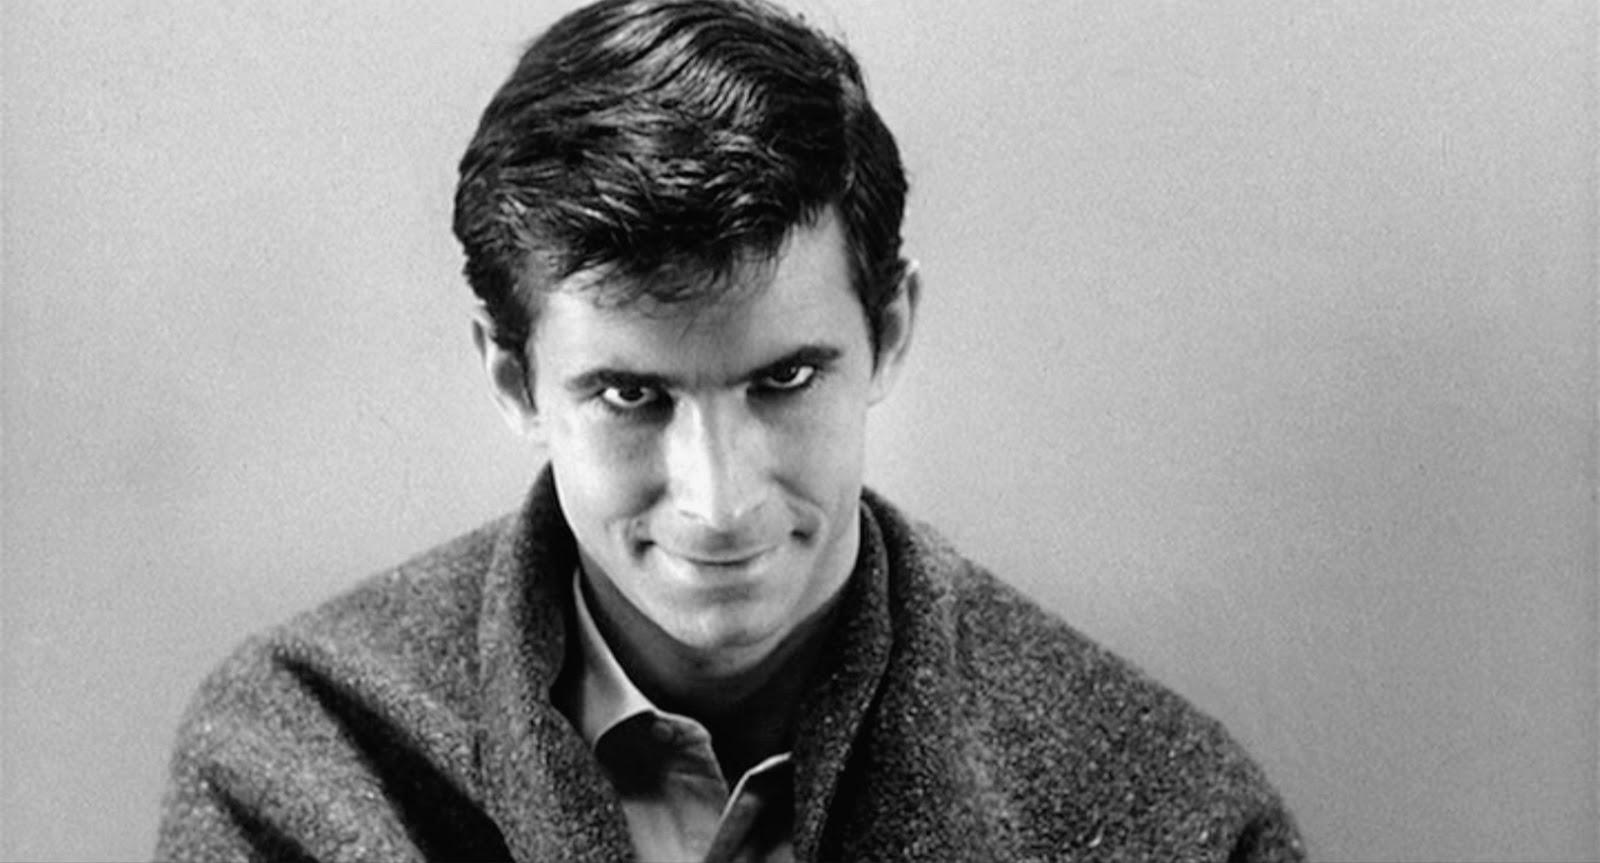 Norman Bates (Anthony Perkins)